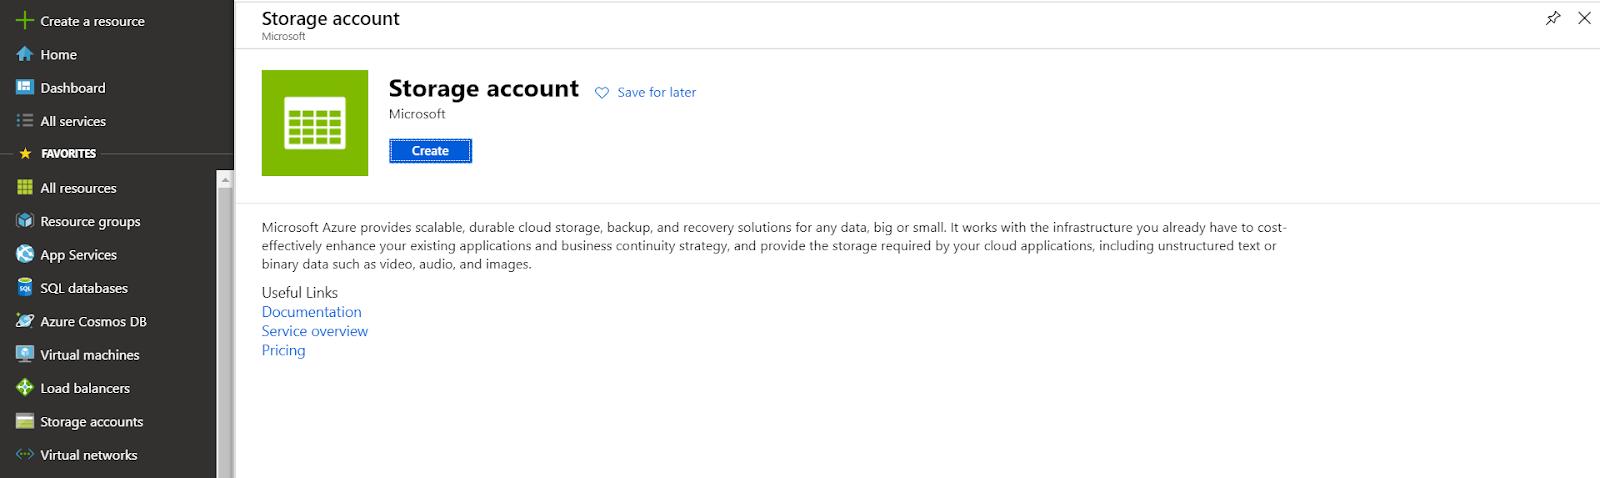 Microsoft Storage Account